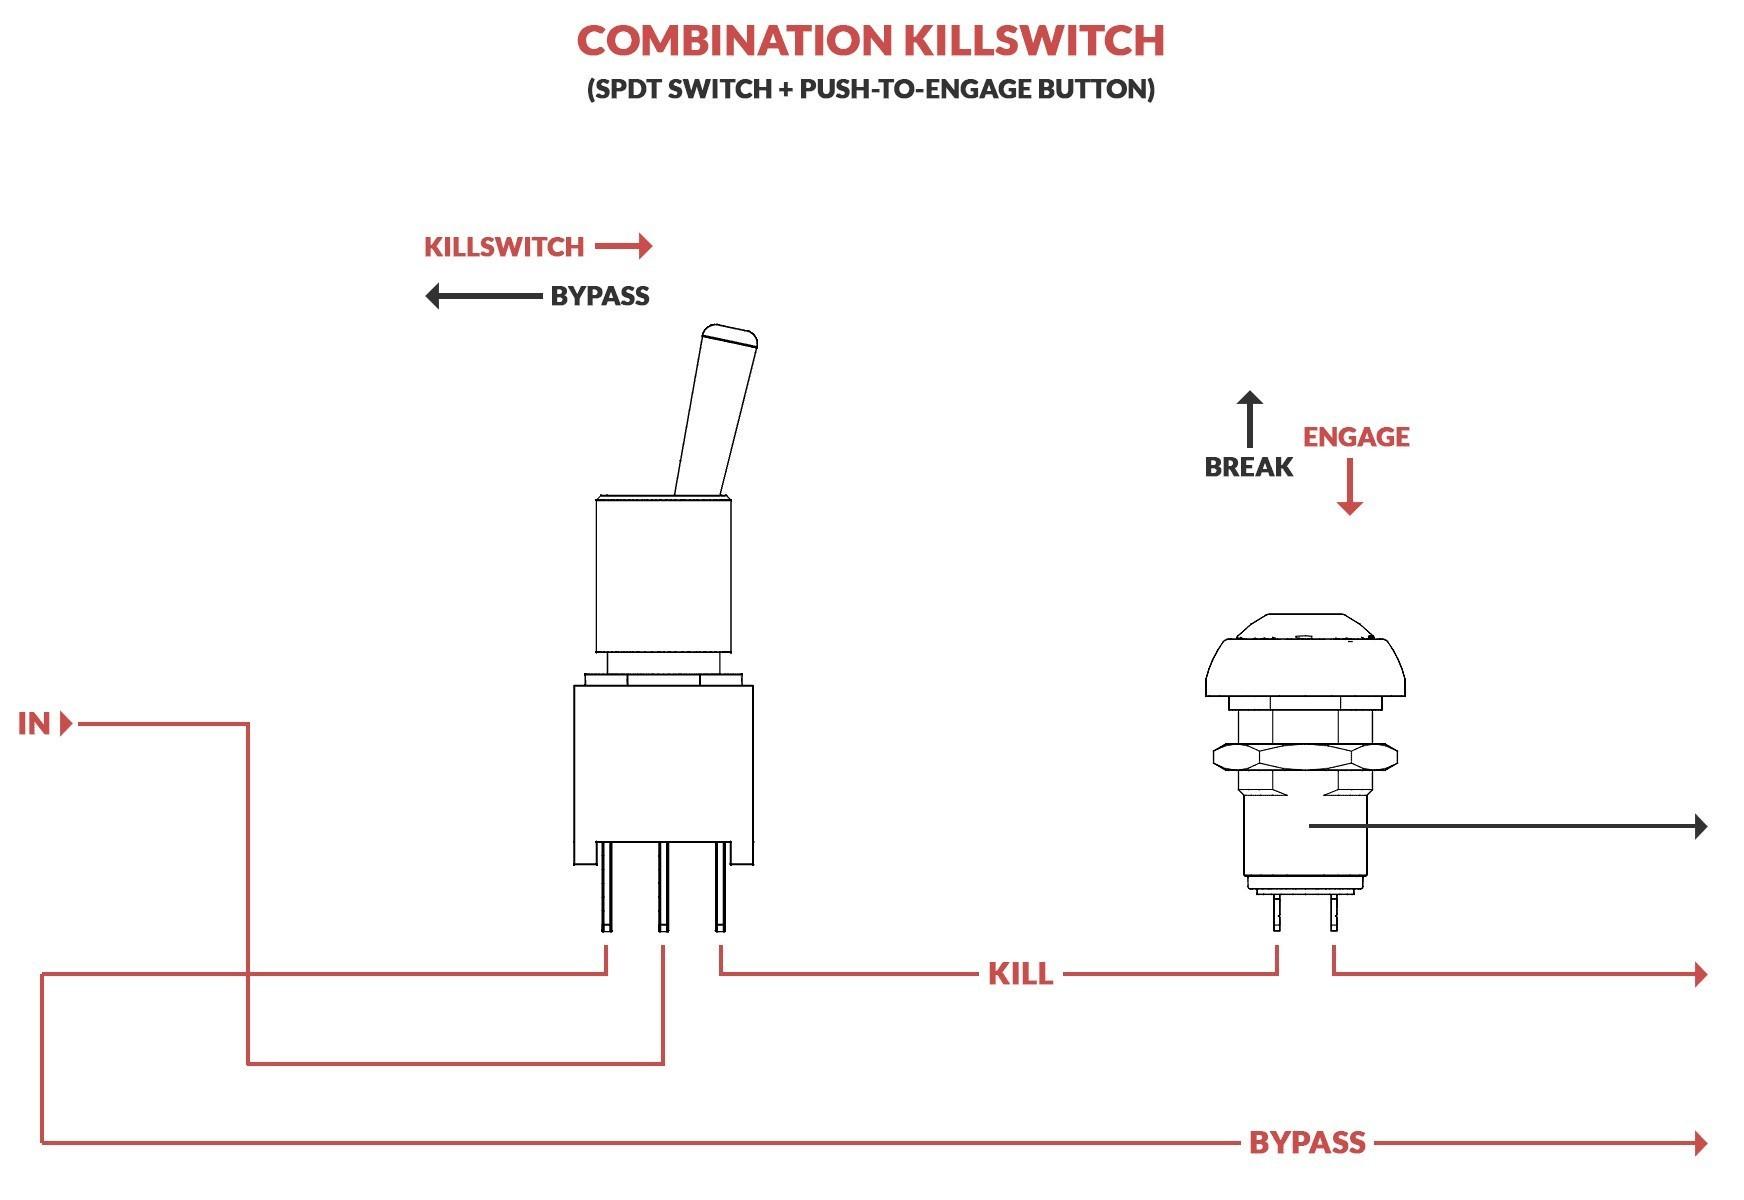 Kill Switch Wiring Diagram Car Kill Switch Relay Wiring Diagram Valid Momentary Copy Arcnx Of Kill Switch Wiring Diagram Car